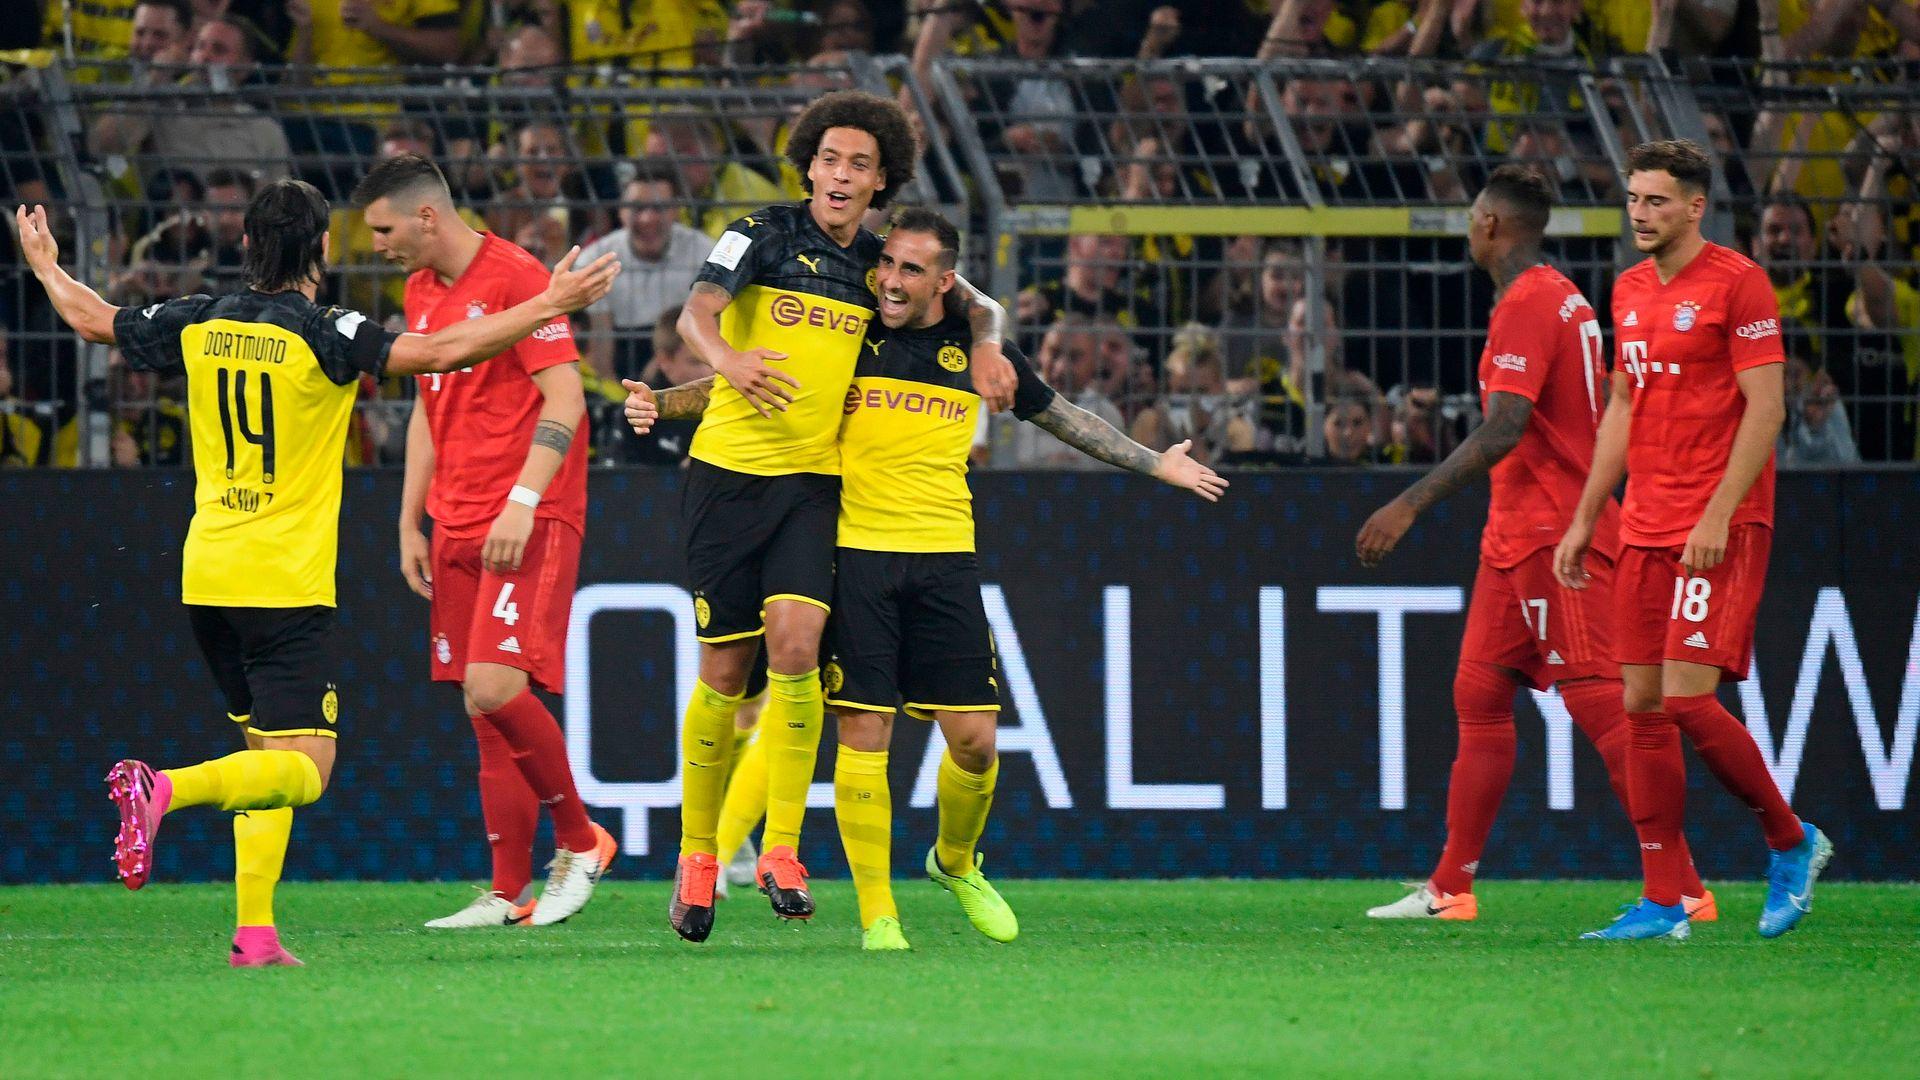 Fc Bayern Munchen Vs Bvb So Sehen Sie Die Bundesliga Heute